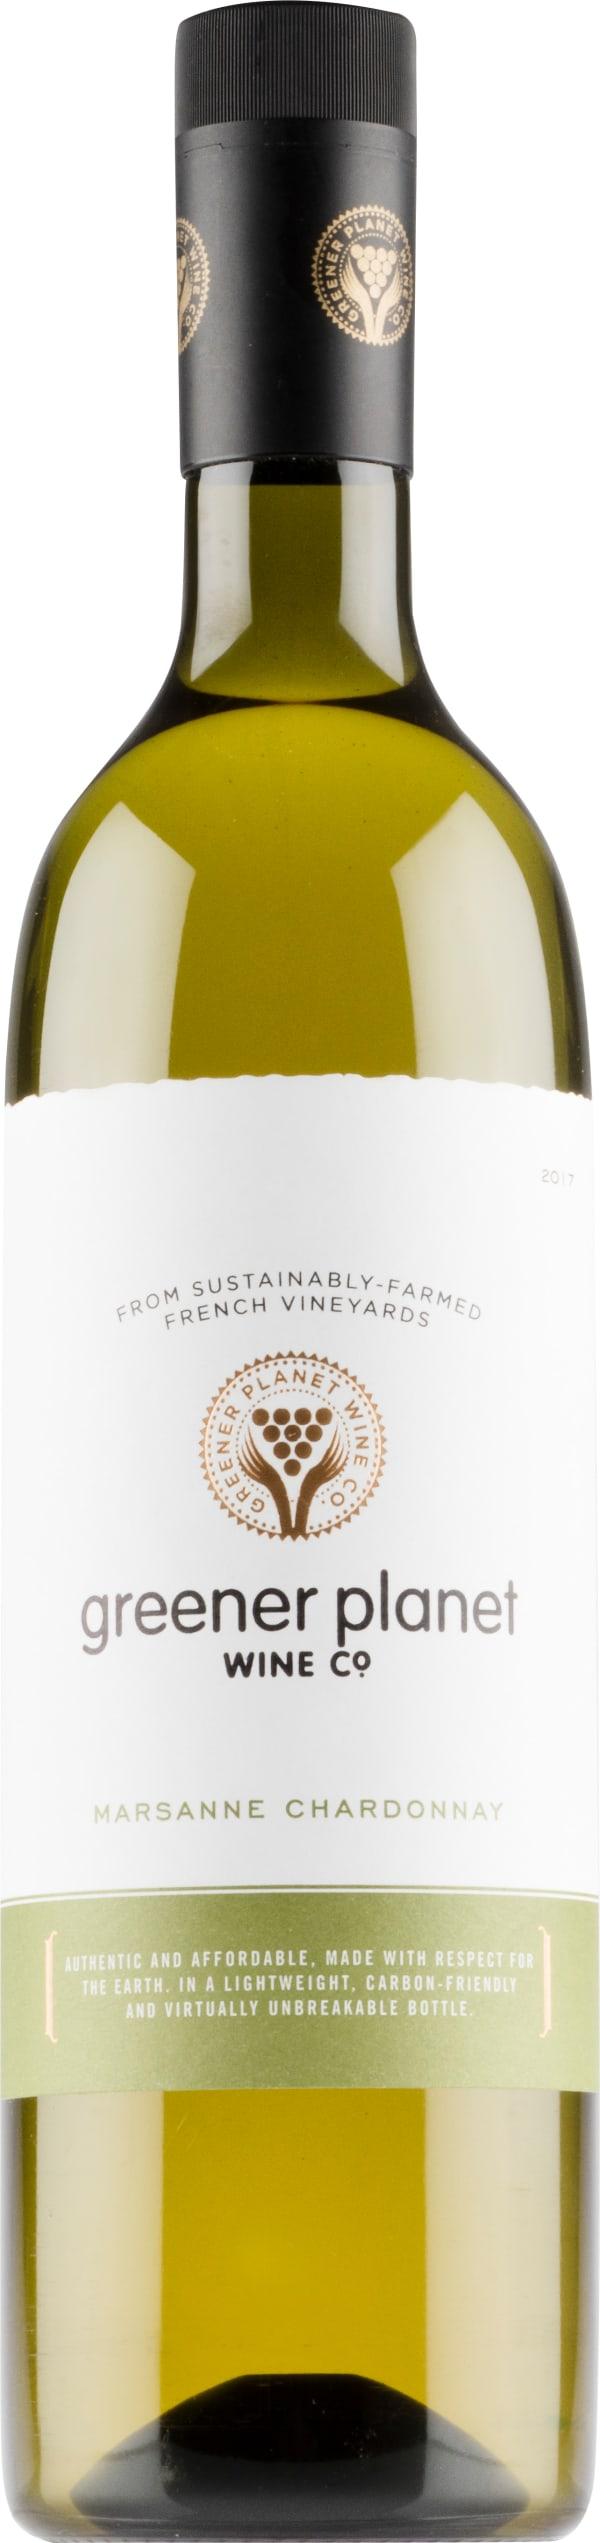 Greener Planet Marsanne Chardonnay 2020 plastflaska